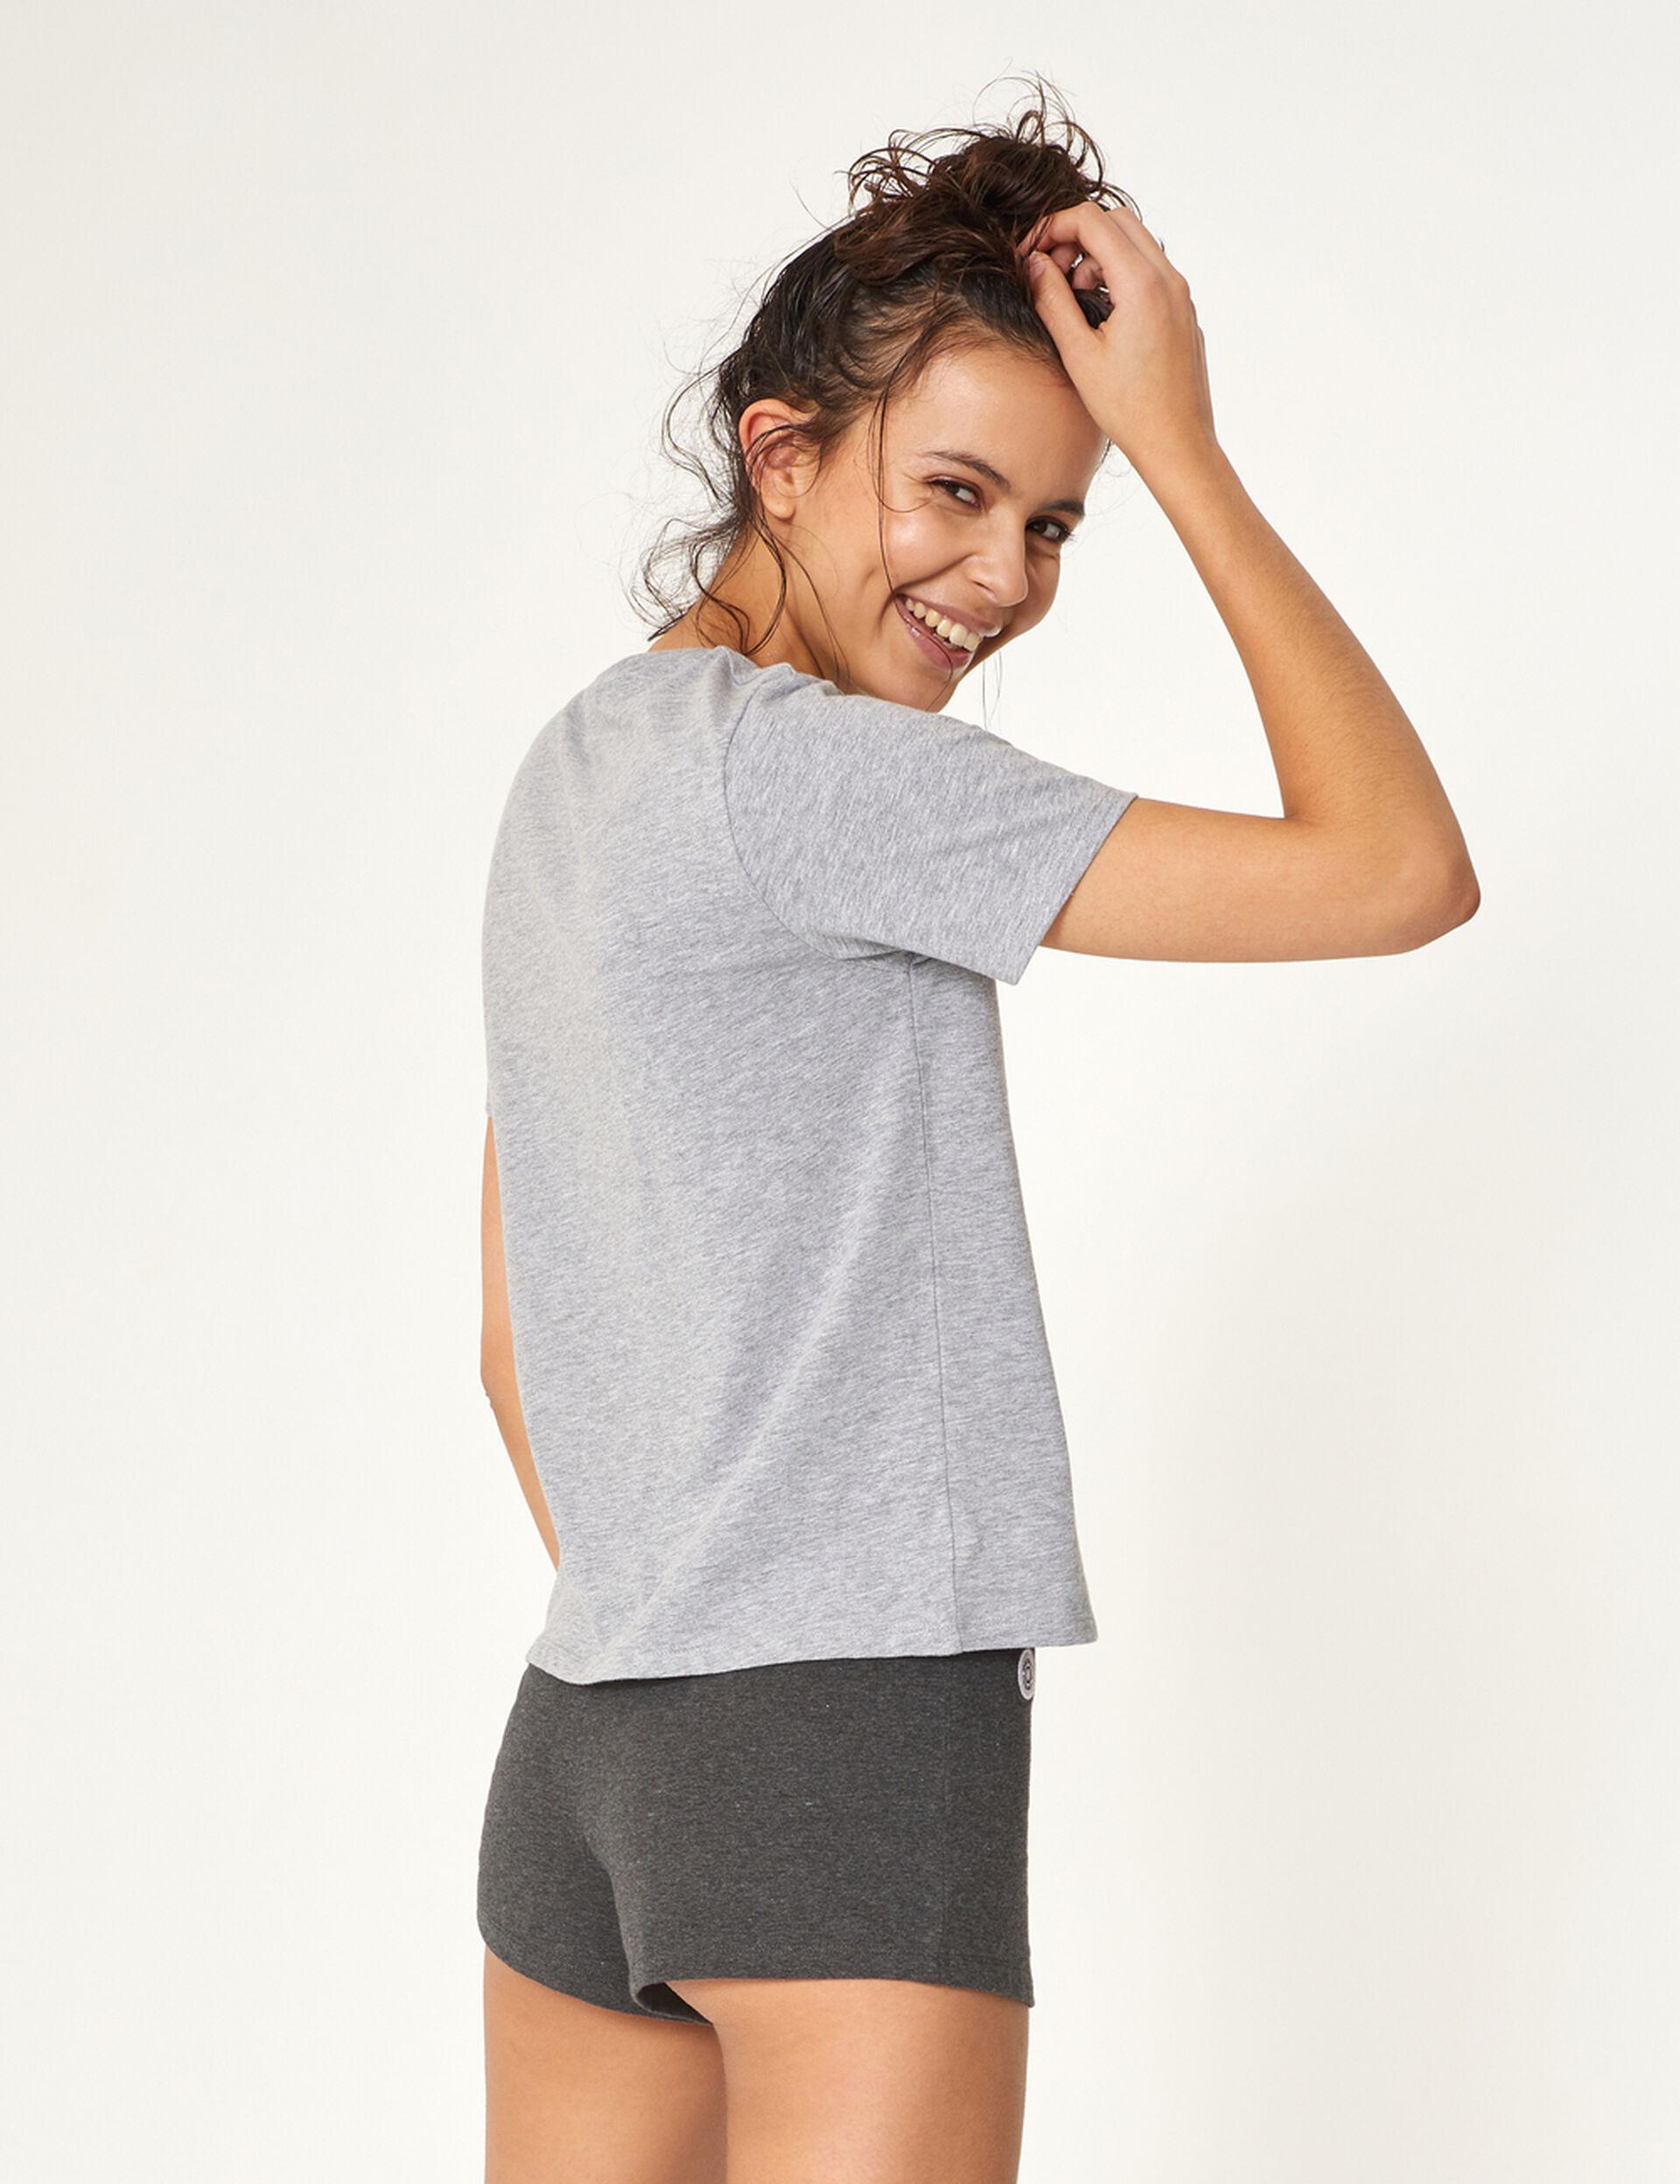 Charcoal grey and pale grey pyjama set